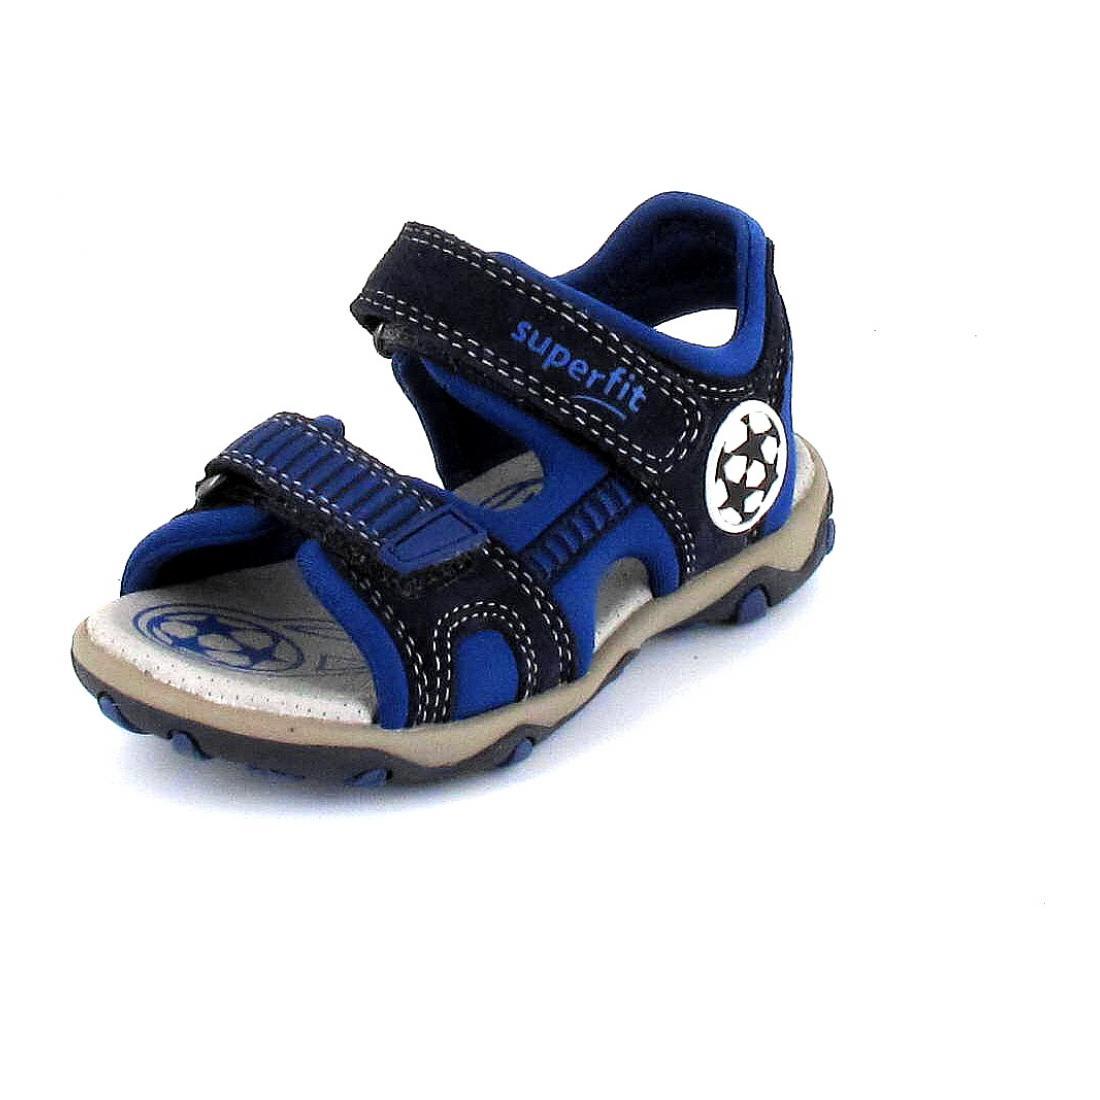 Superfit Sandale Mike 3.0